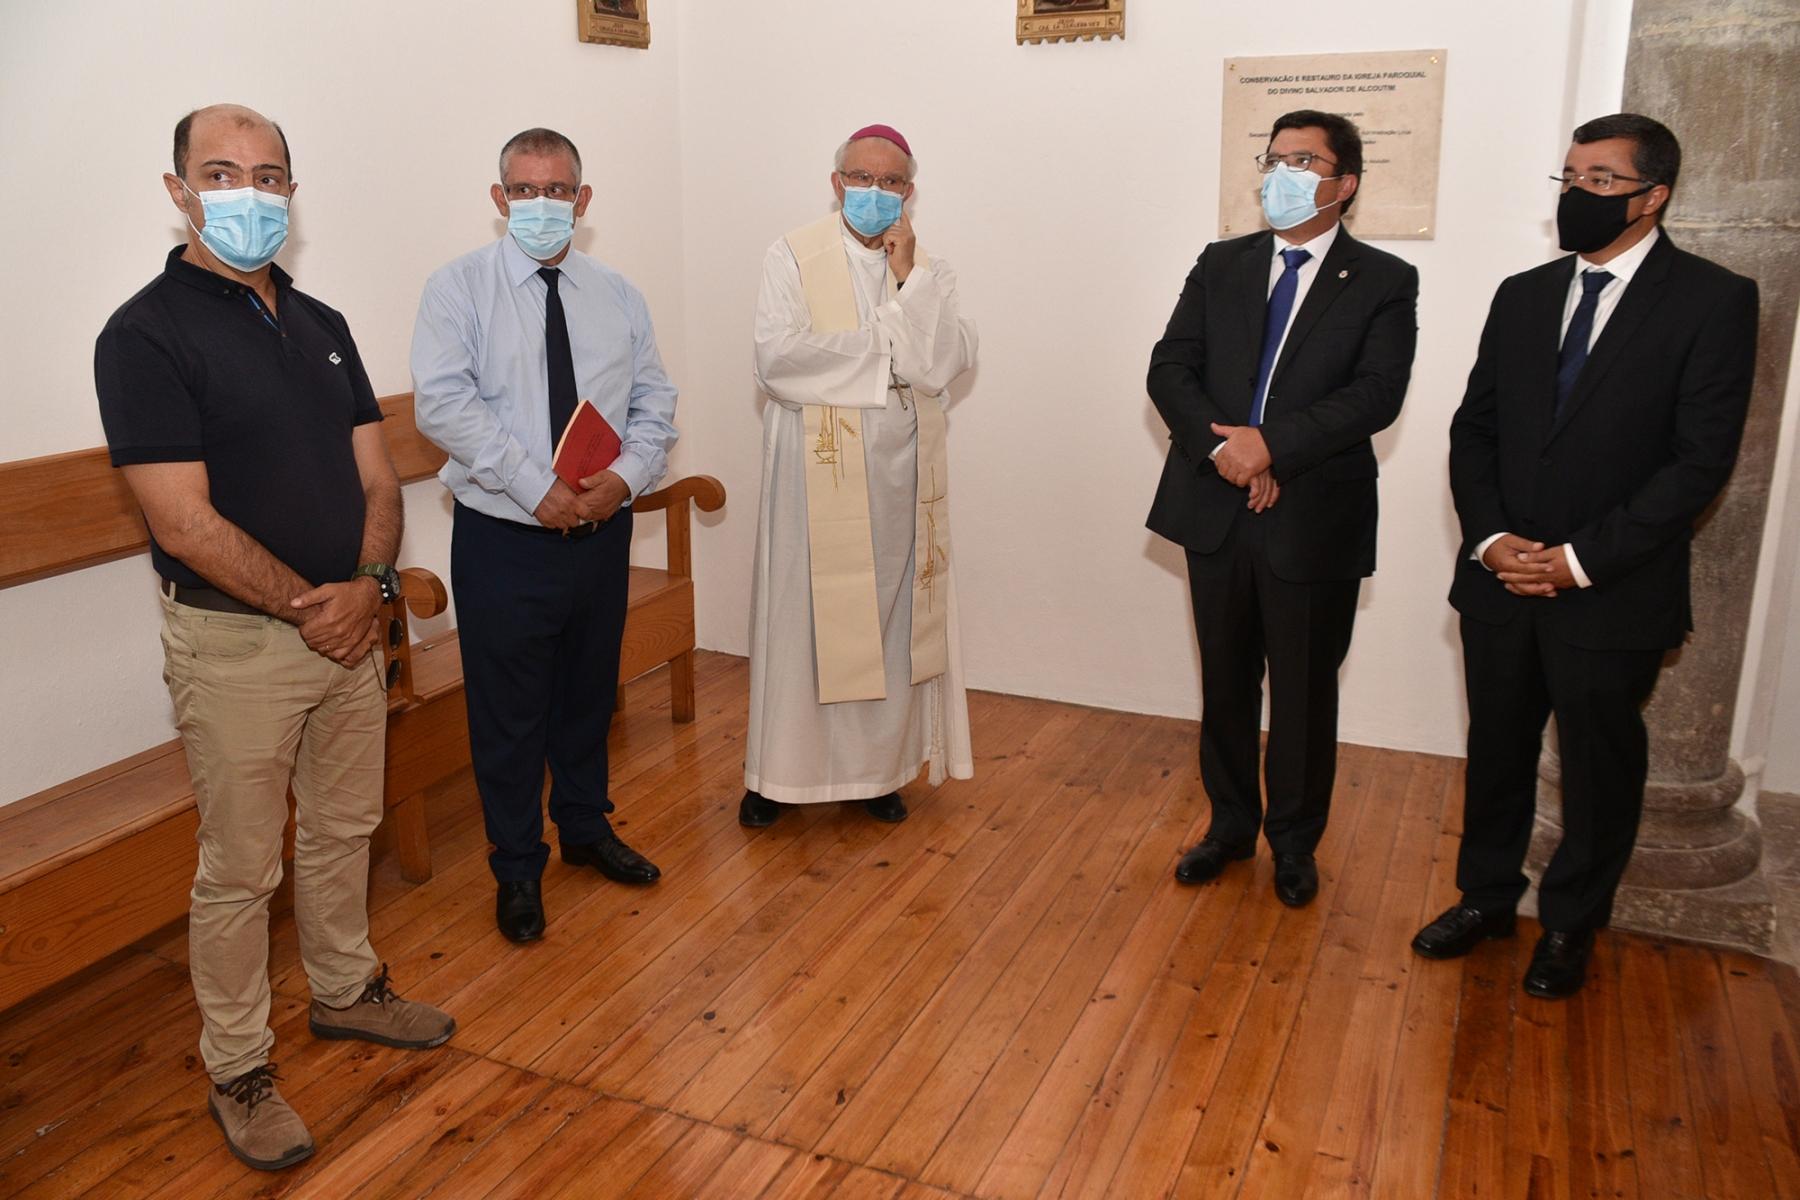 Inauguracao_bencao_obras_restauro_igreja_alcoutim-40